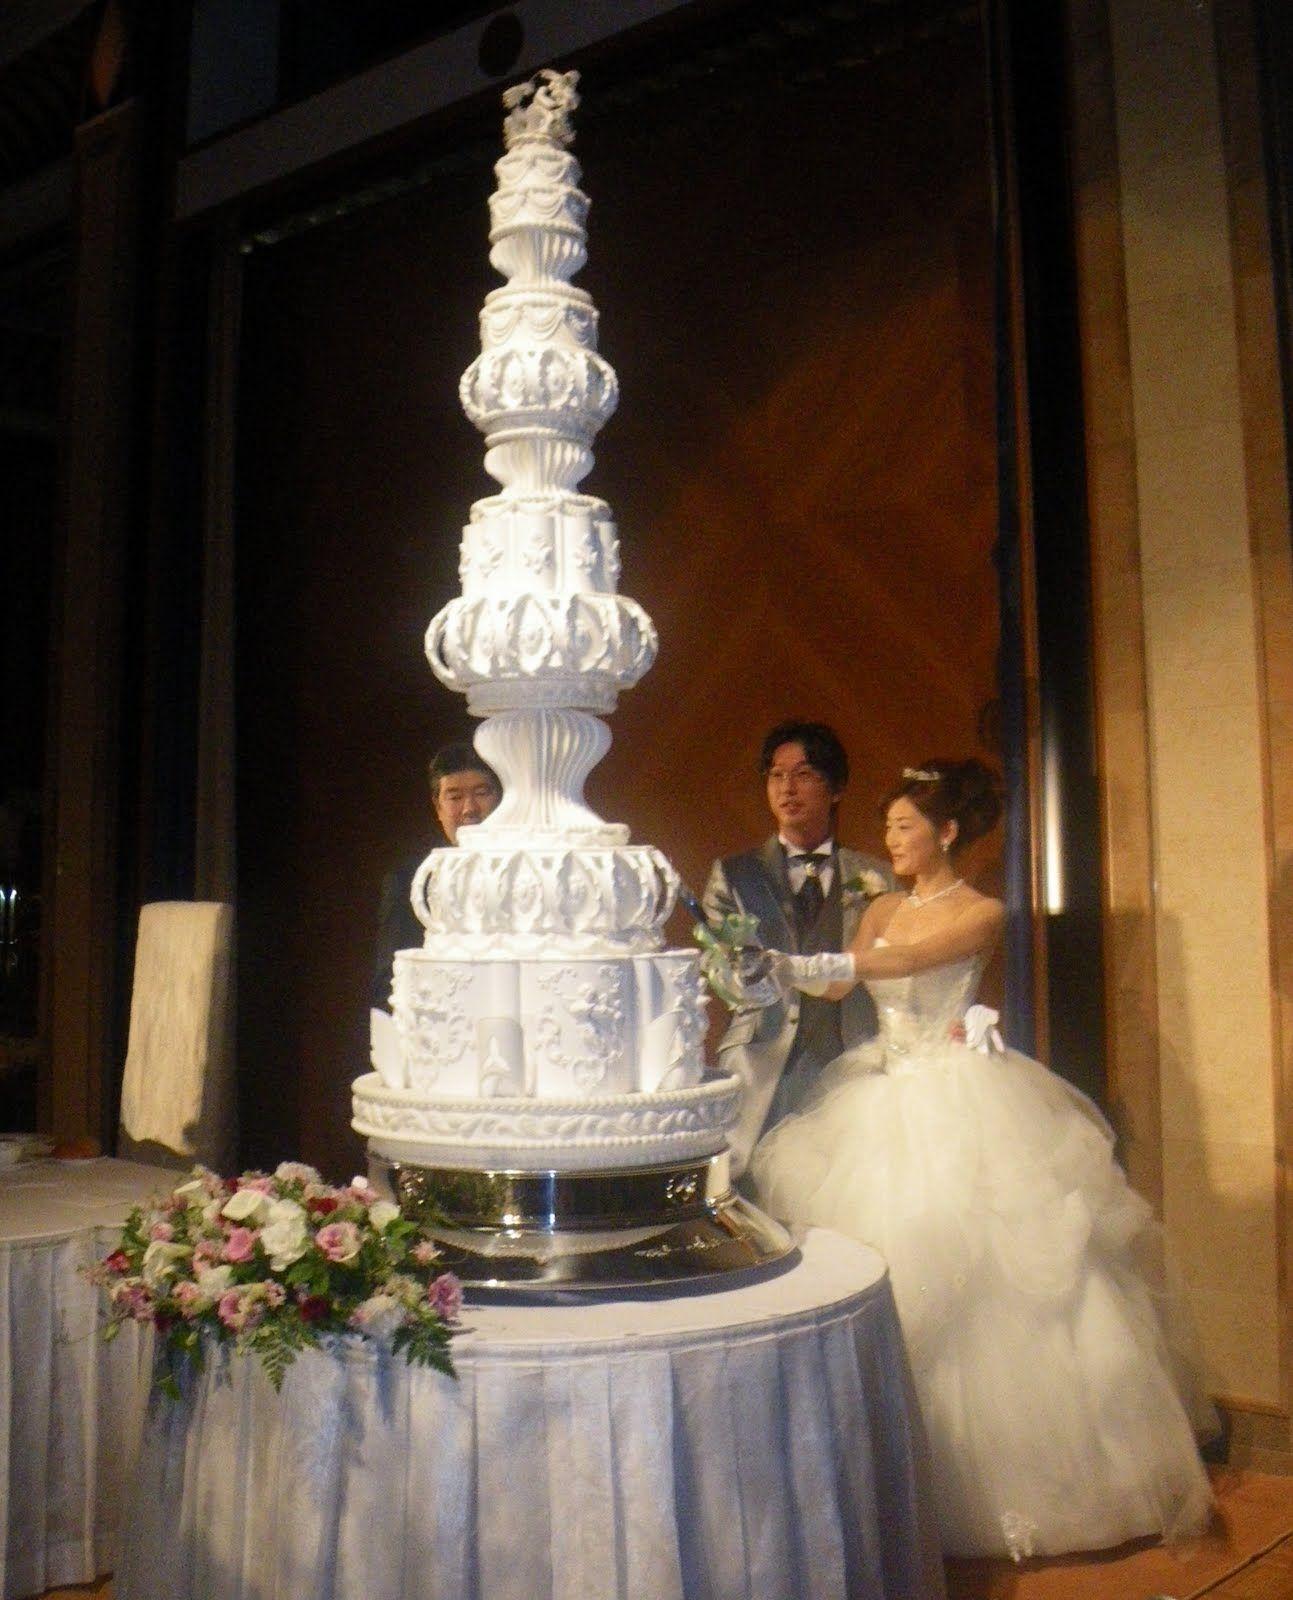 Giant Wedding Cake Jpg 1293 1600 Huge Wedding Cakes Wedding Cake Art Tall Wedding Cakes